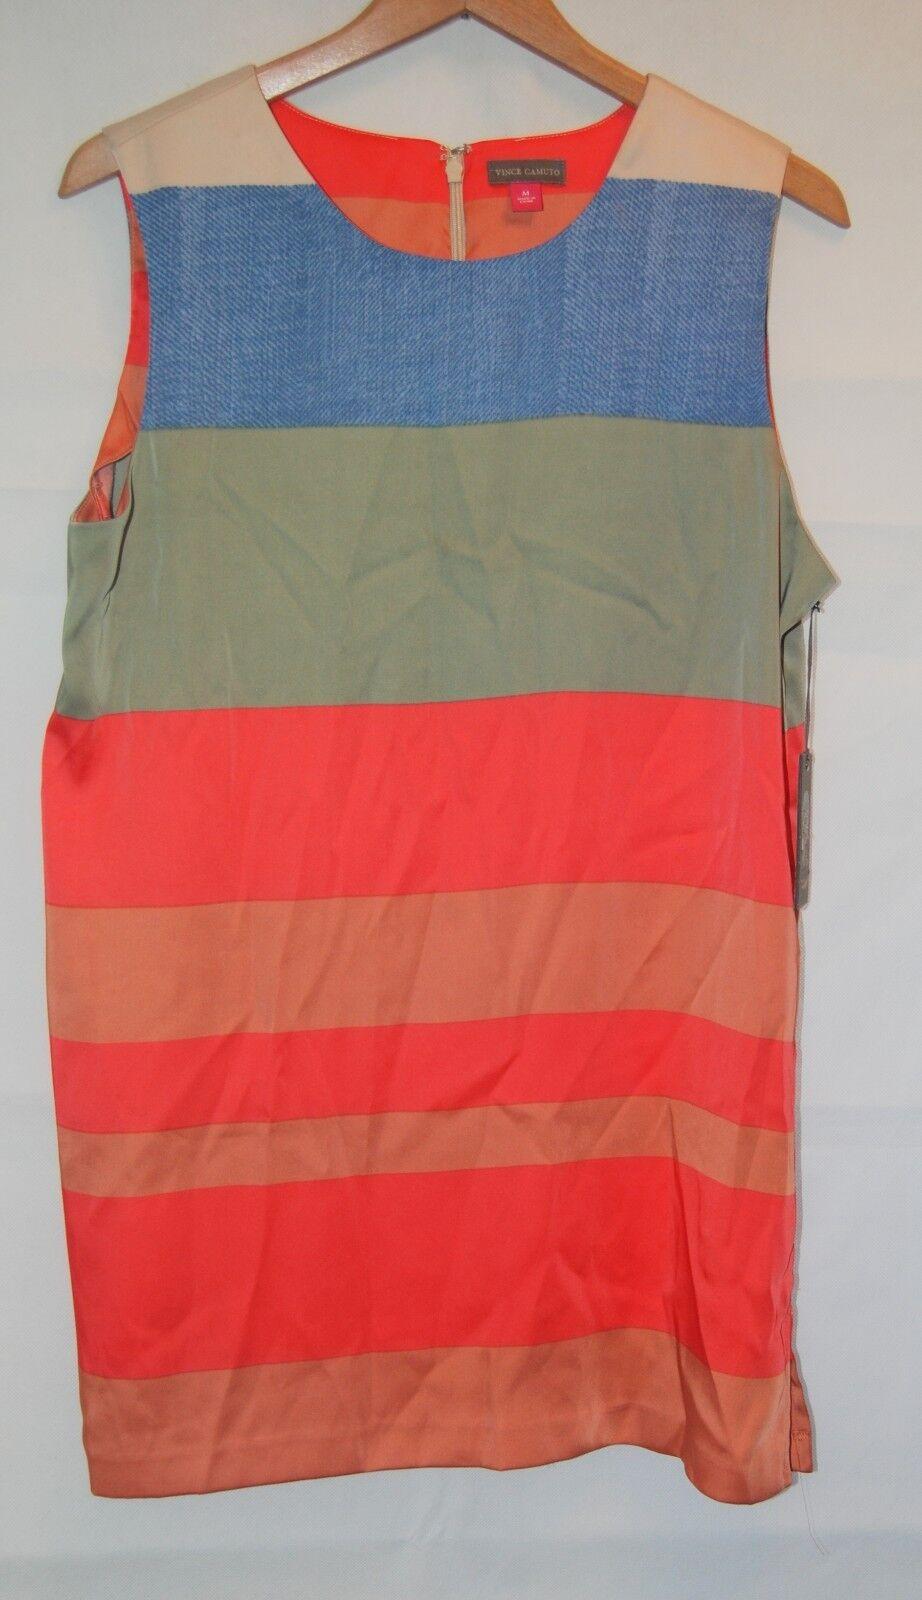 NWT Vince Camuto Short Club Dress M Denim bluee Sage Coral Peach Striped Party